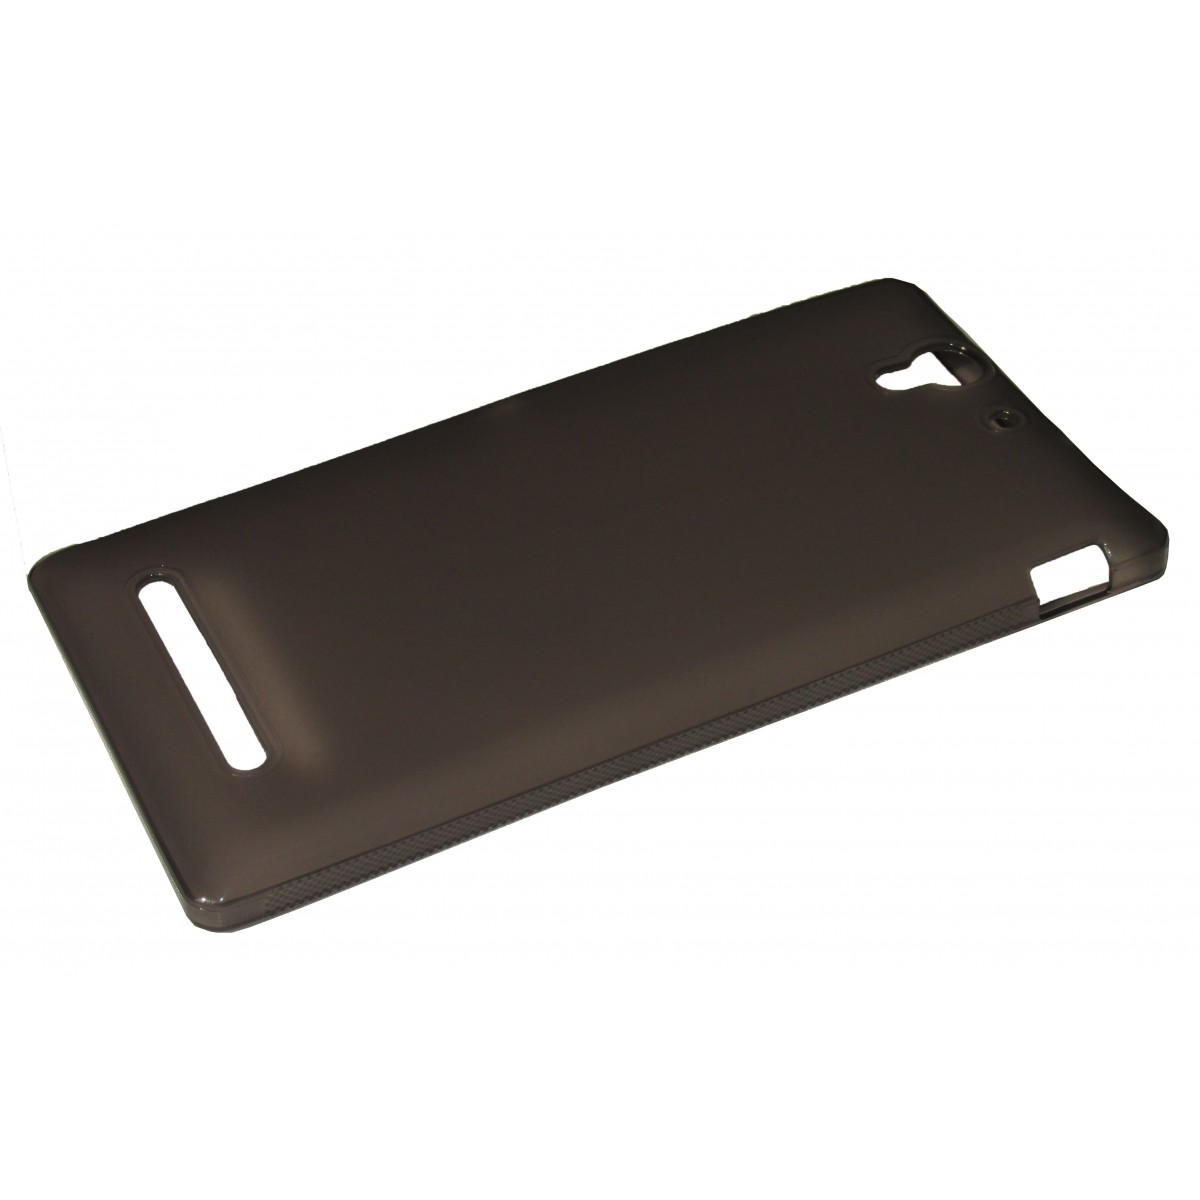 Capa de Tpu para Sony Xperia C3 D2533 D2502 Grafite